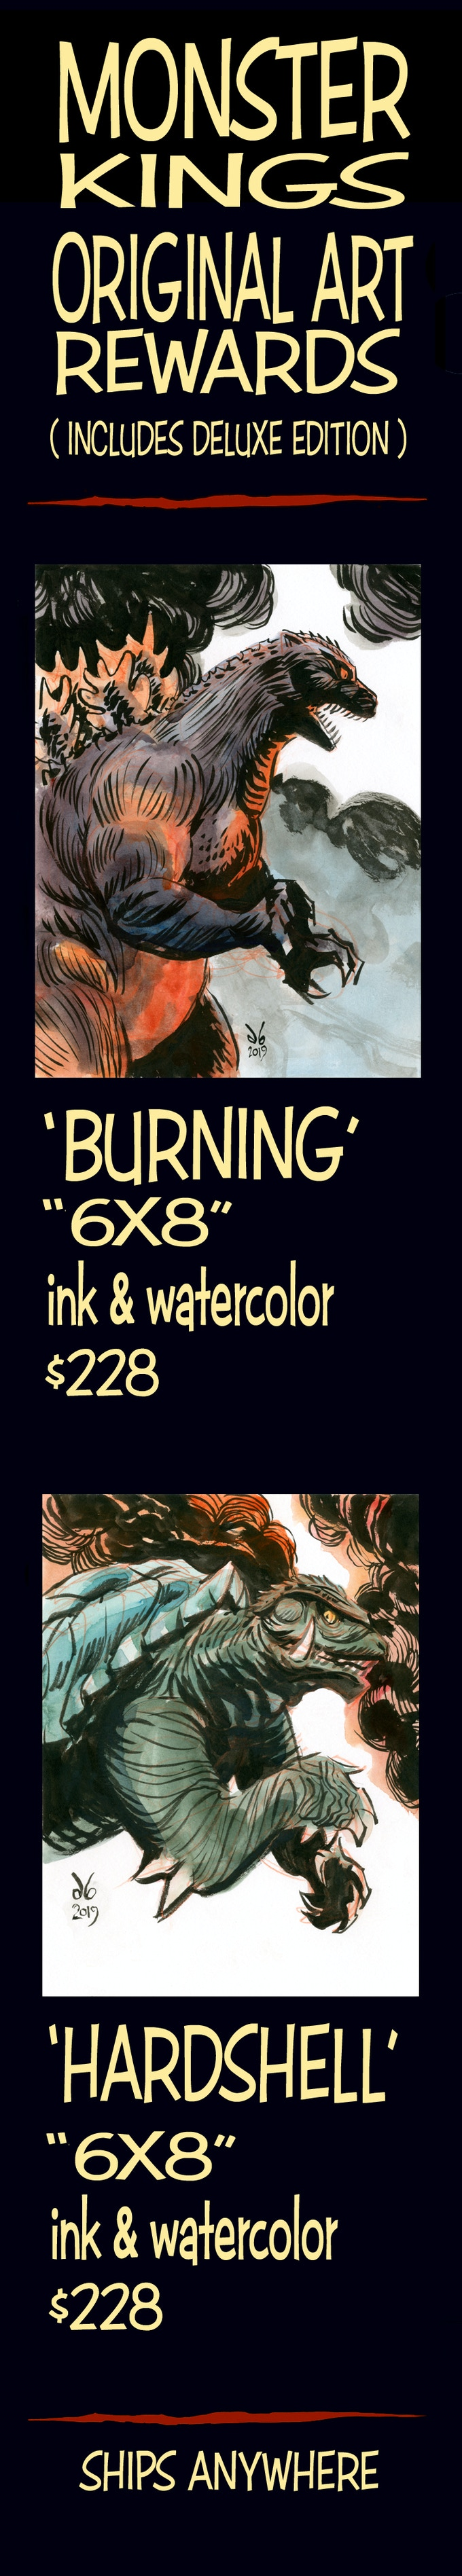 "Hand-drawn and painted""6x8"" Original Art Rewards"